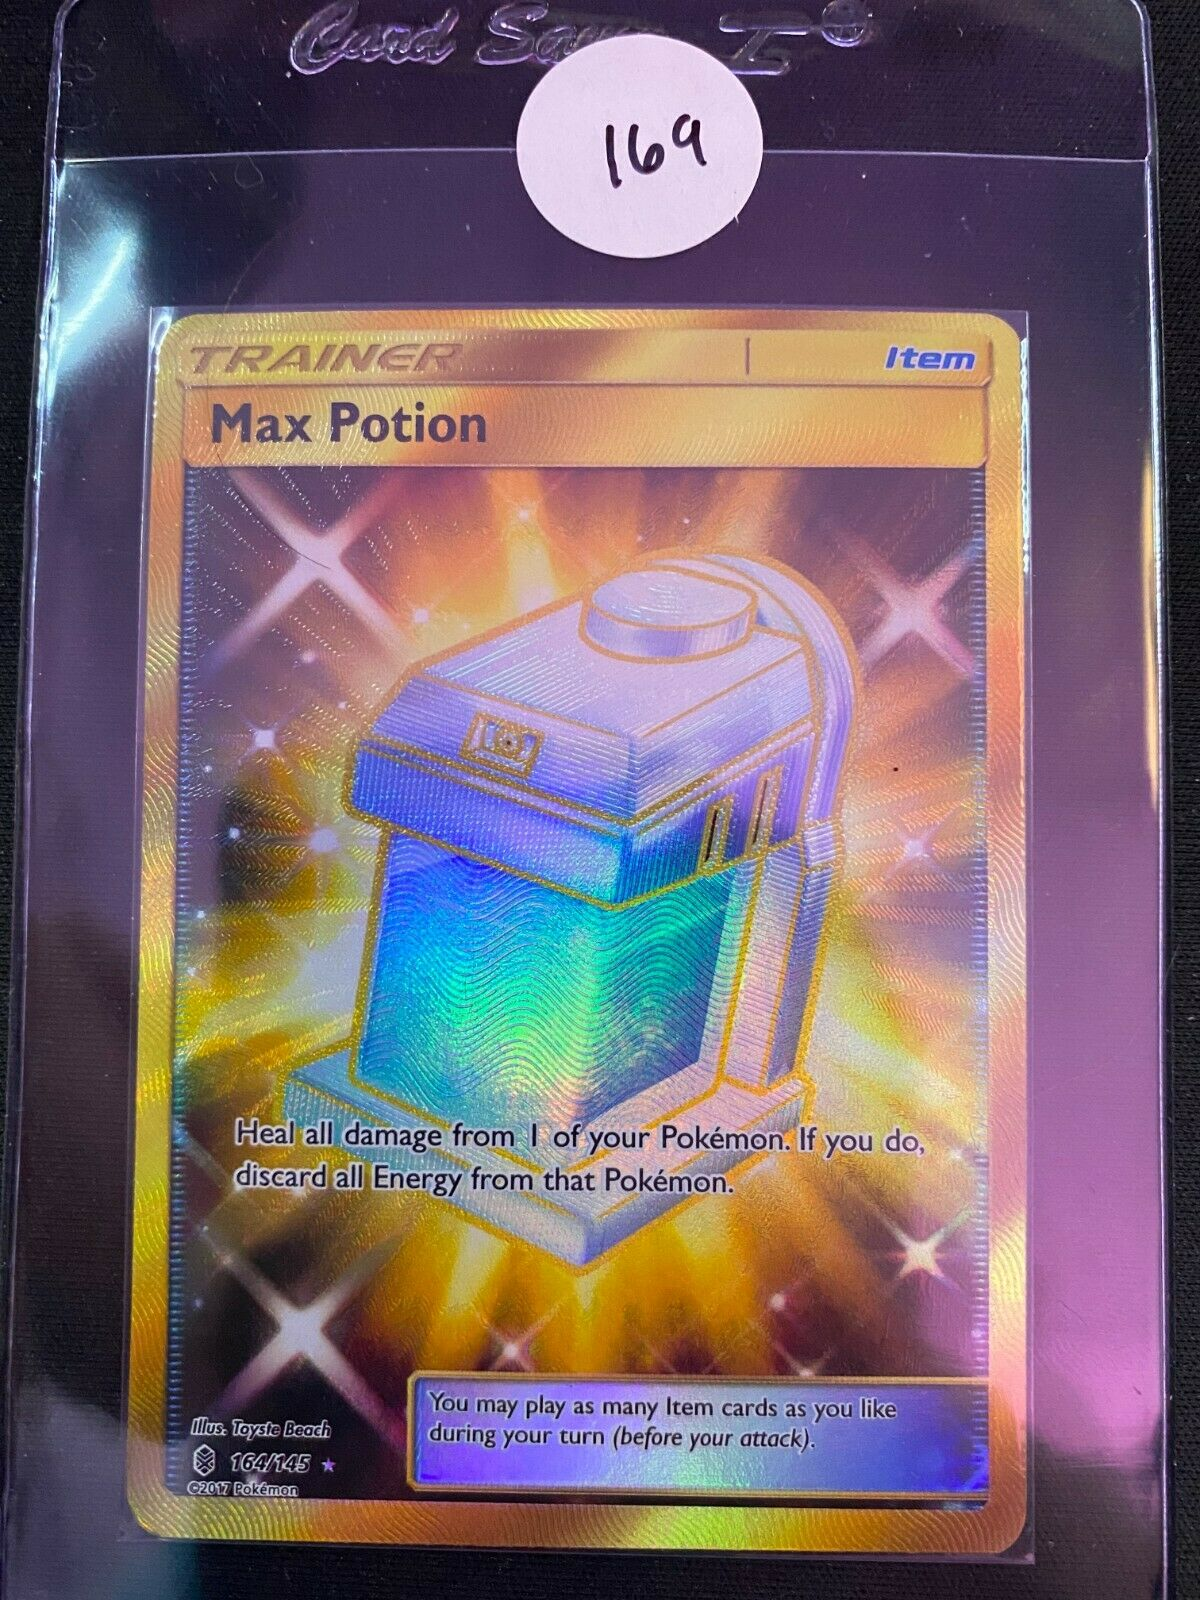 LP FULL ART Pokemon MAX POTION Card GUARDIANS RISING Set 164//145 Trainer Item